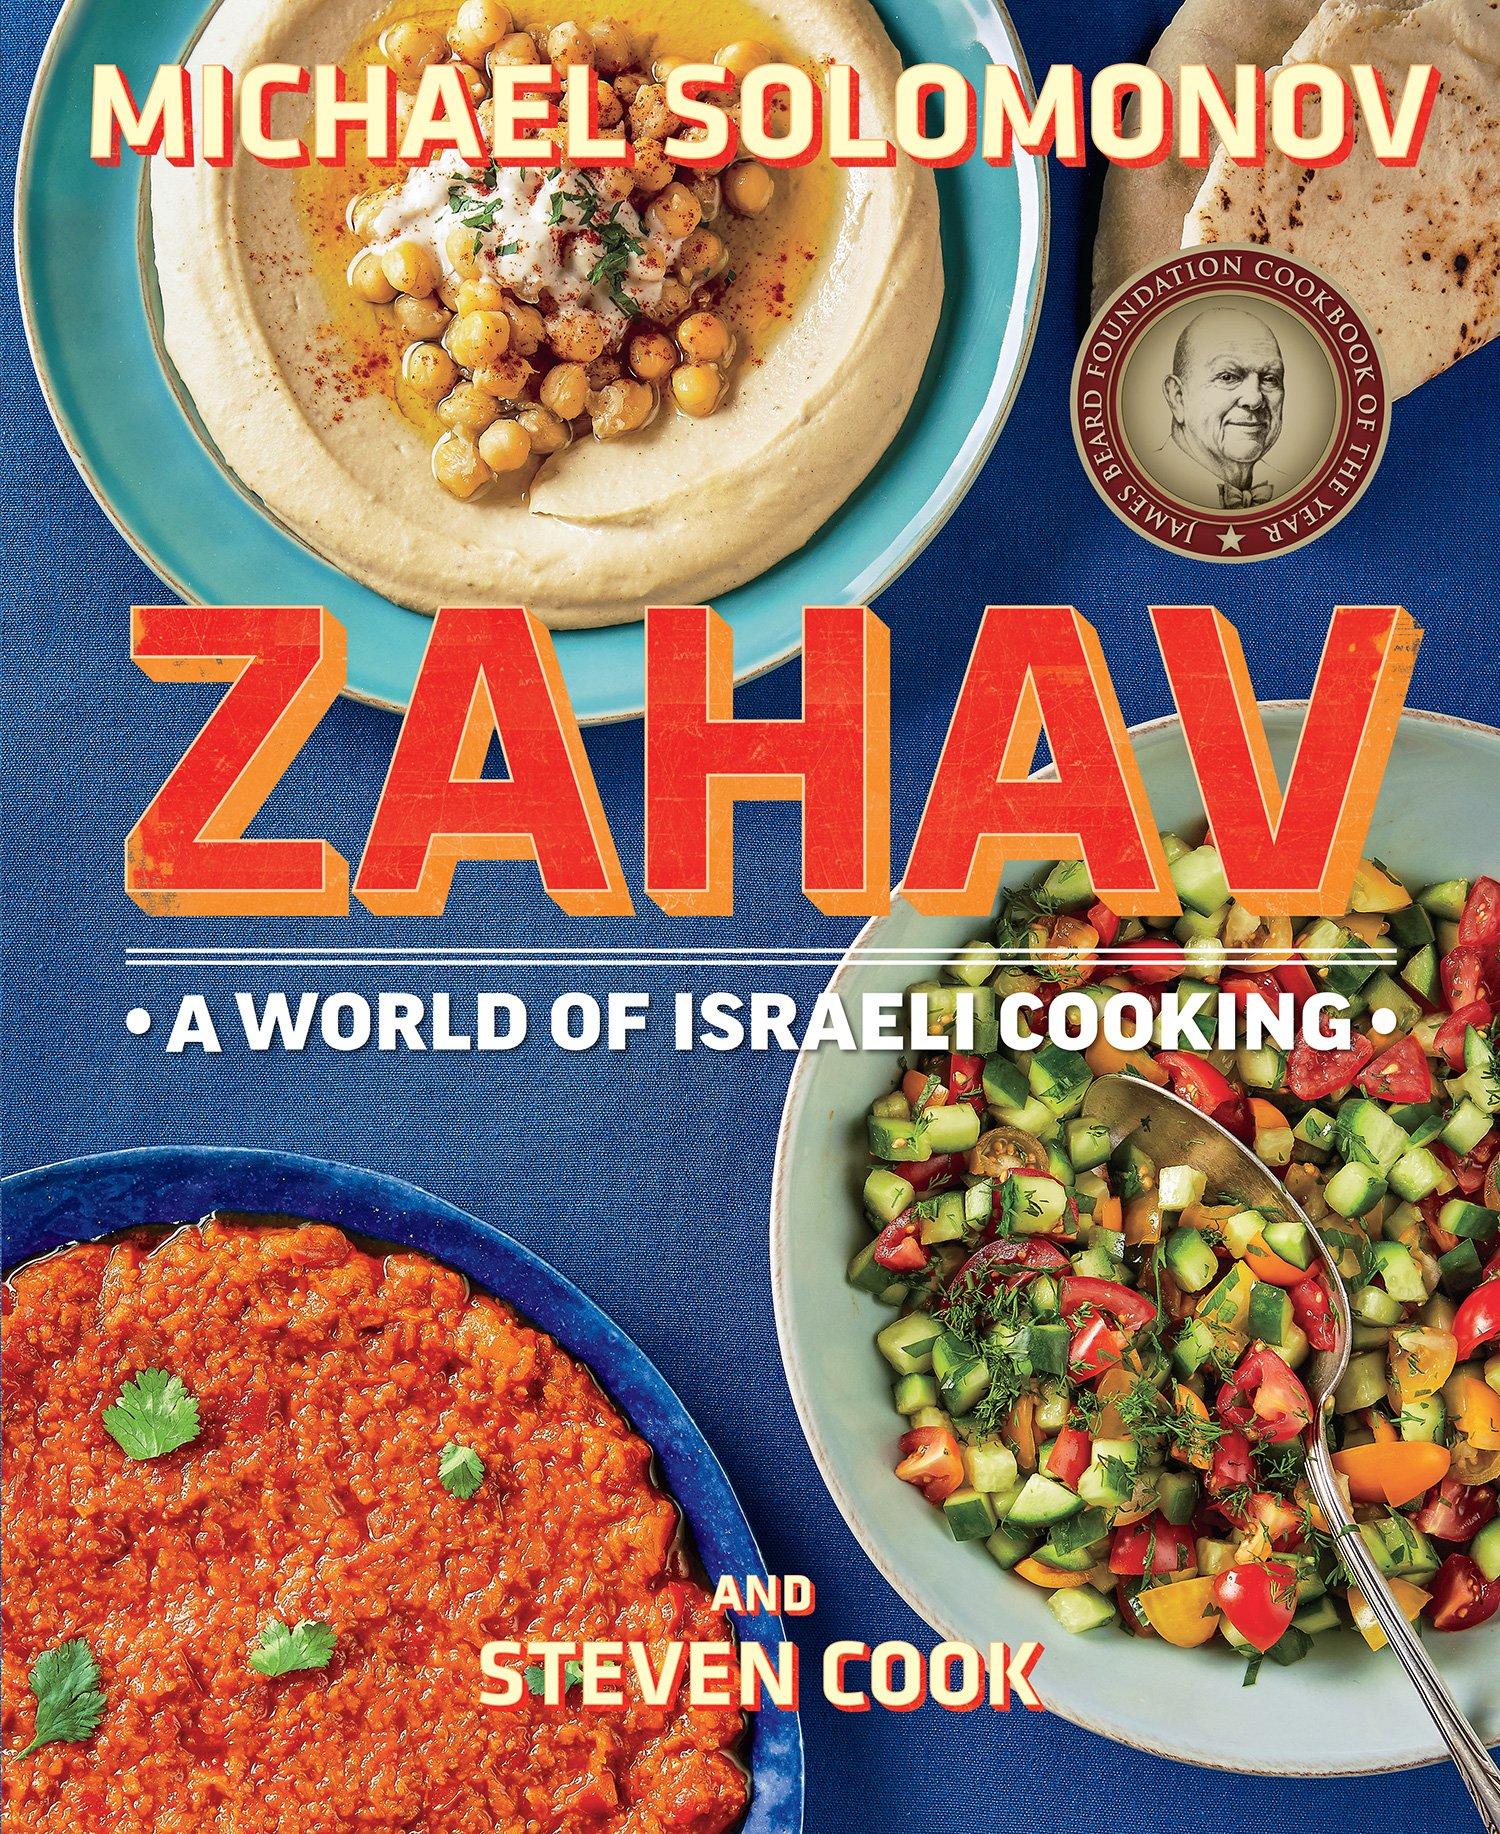 Zahav: A World of Israeli Cooking by Rux Martin/Houghton Mifflin Harcourt